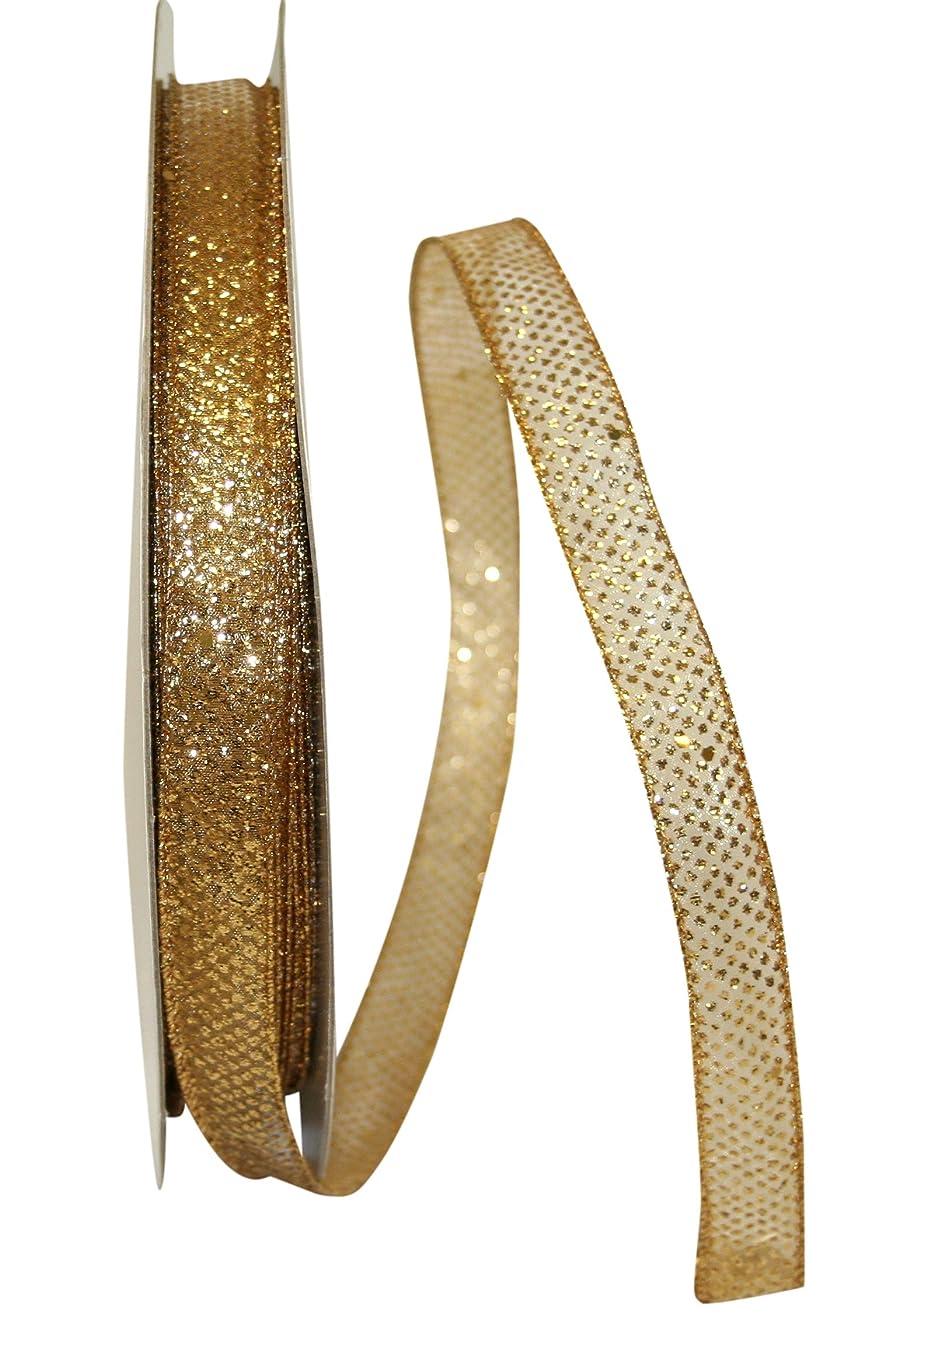 Reliant Ribbon 25741W-035-03K Sheer Glitter Dot Wired Edge Ribbon, 5/8 Inch X 50 Yards, Gold